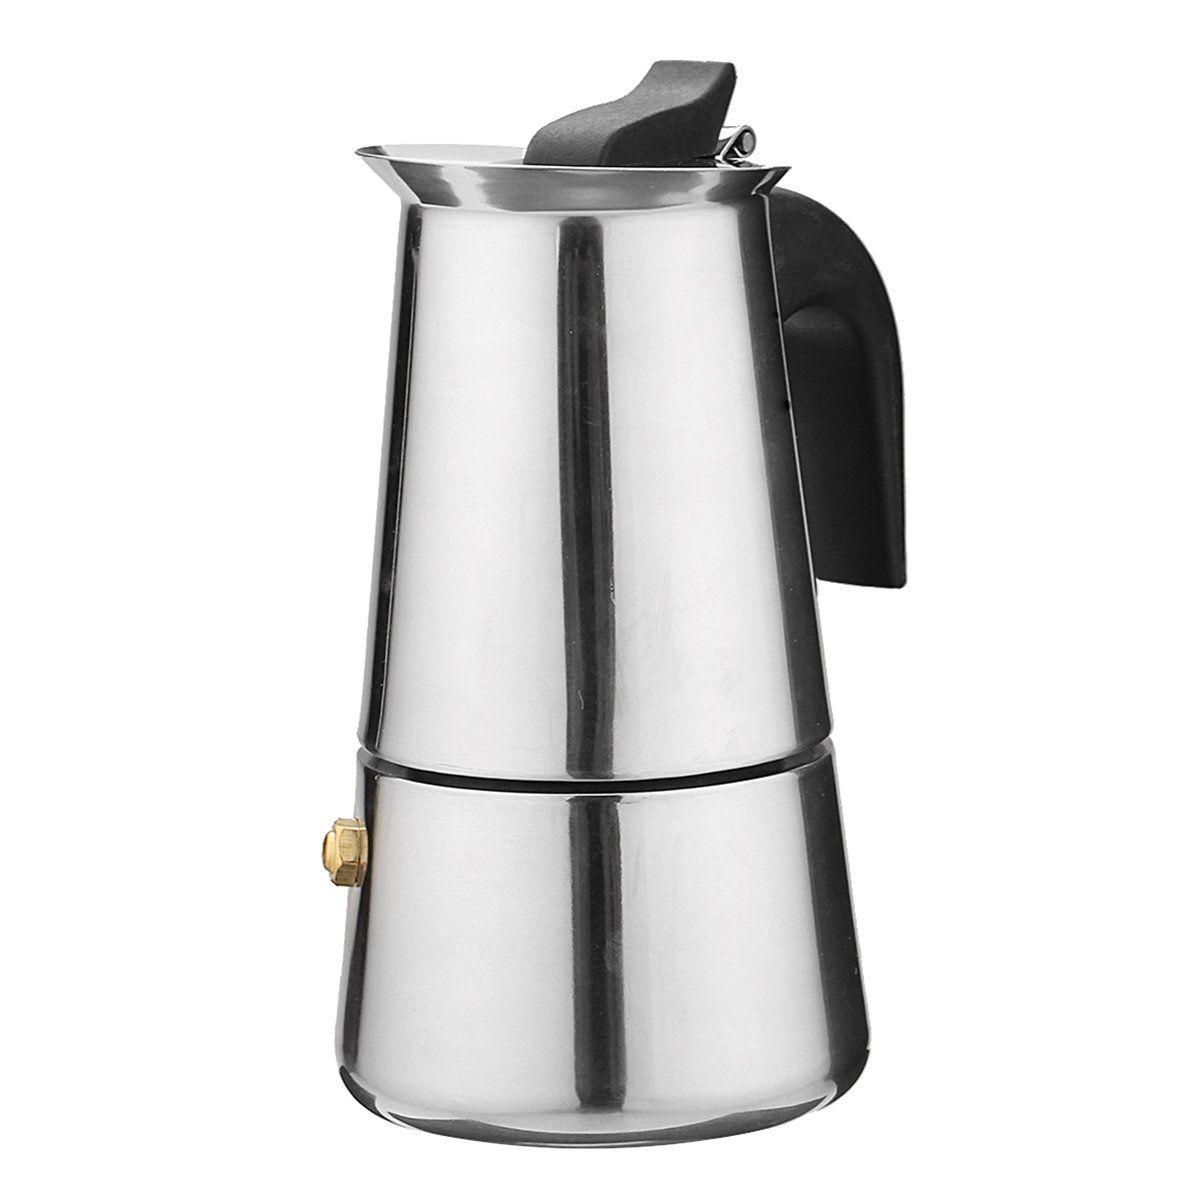 Ml percolator stove top espresso moka coffee maker pot stainless